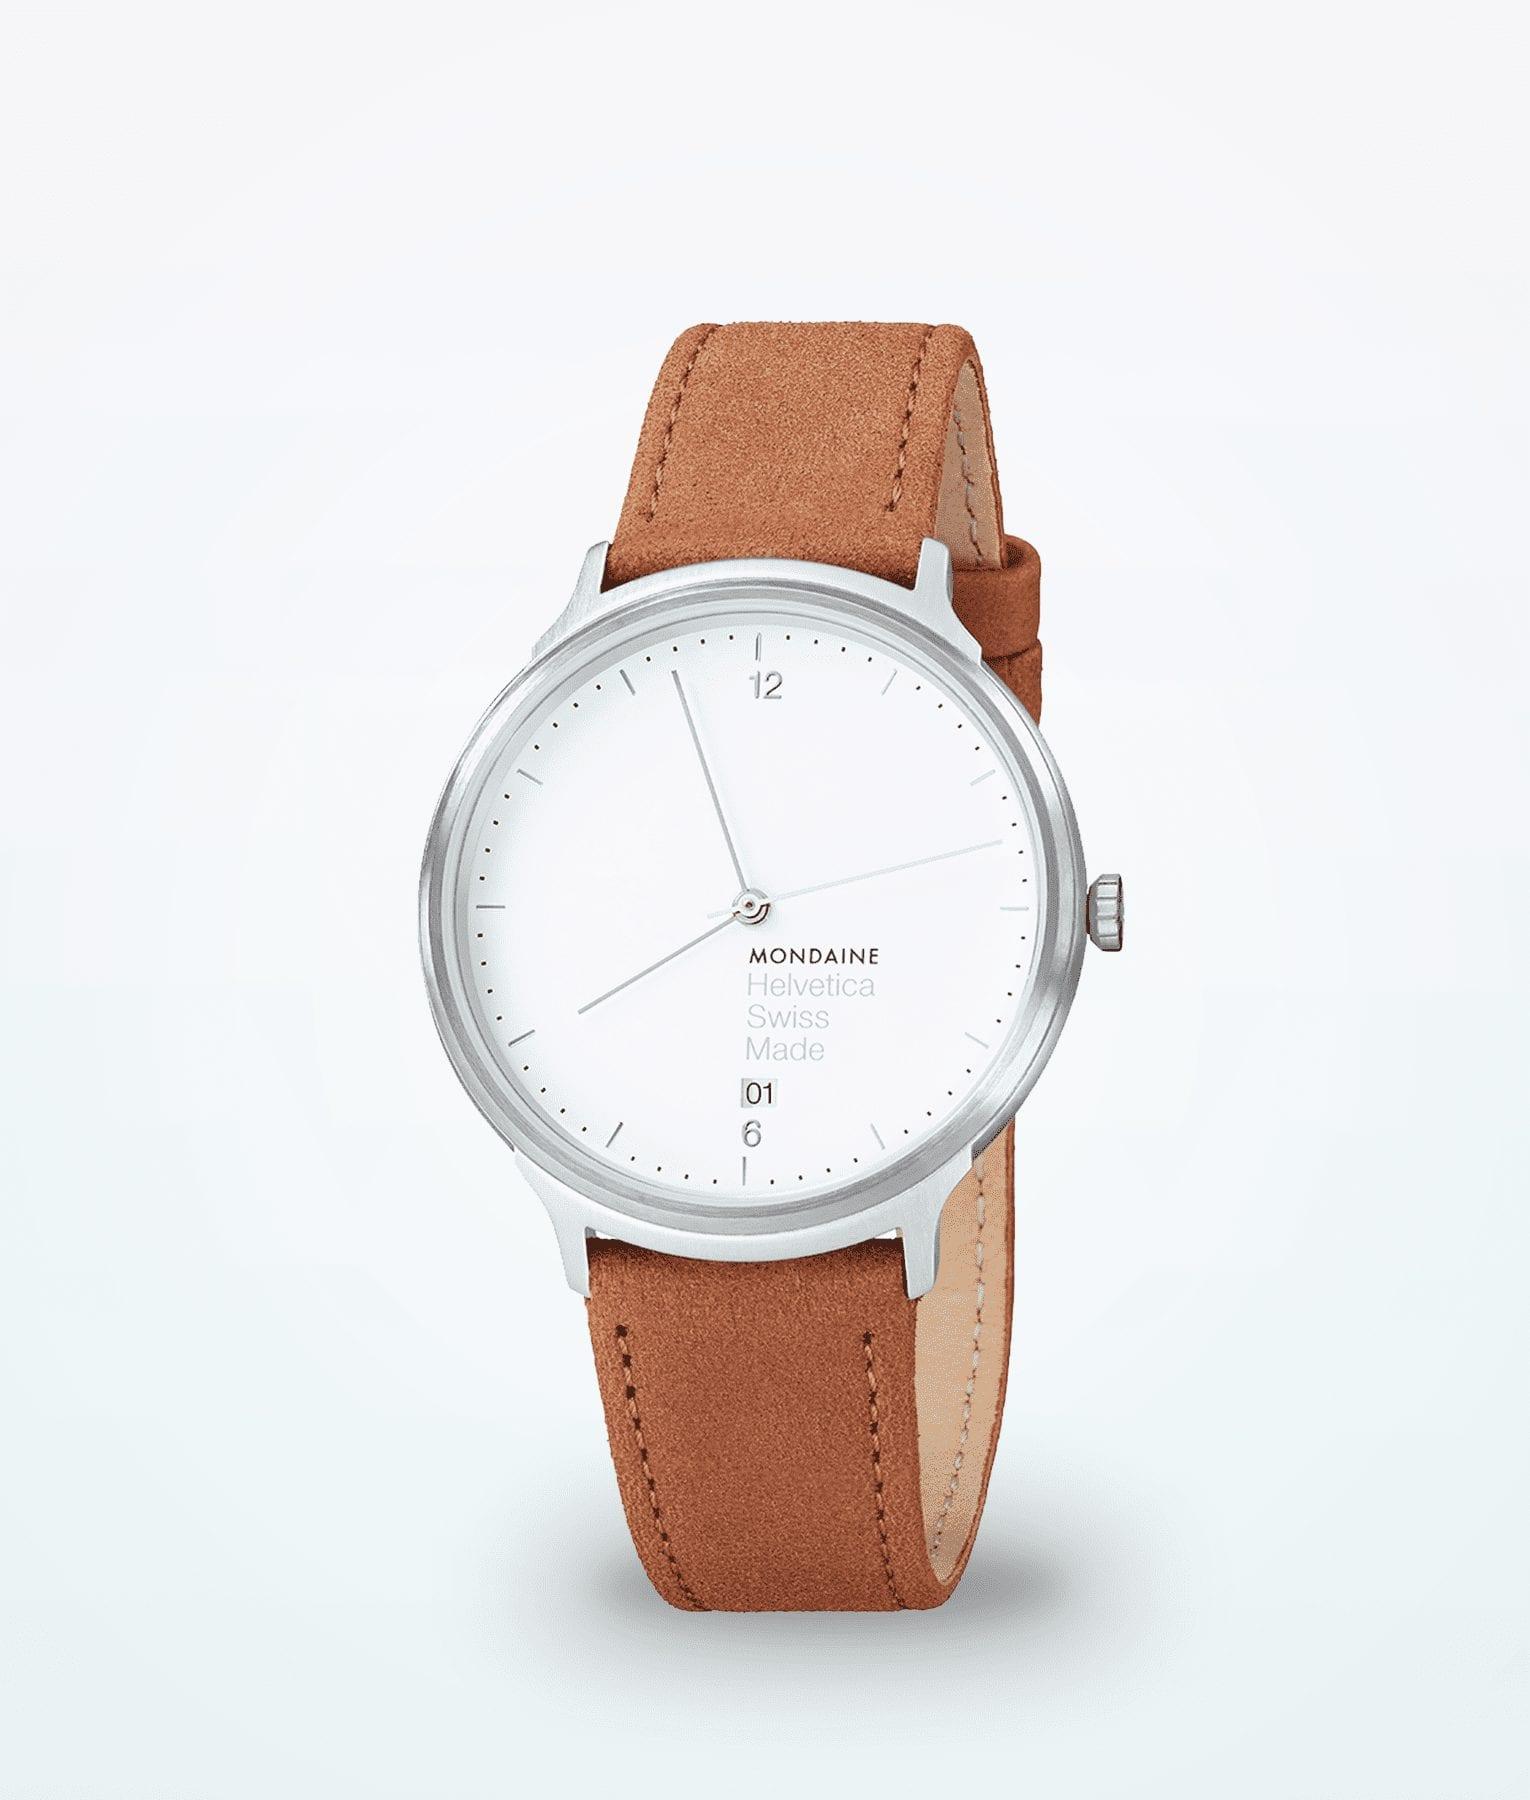 mondaine-helvetica-no1-regular-unisex-wristwatch-brown